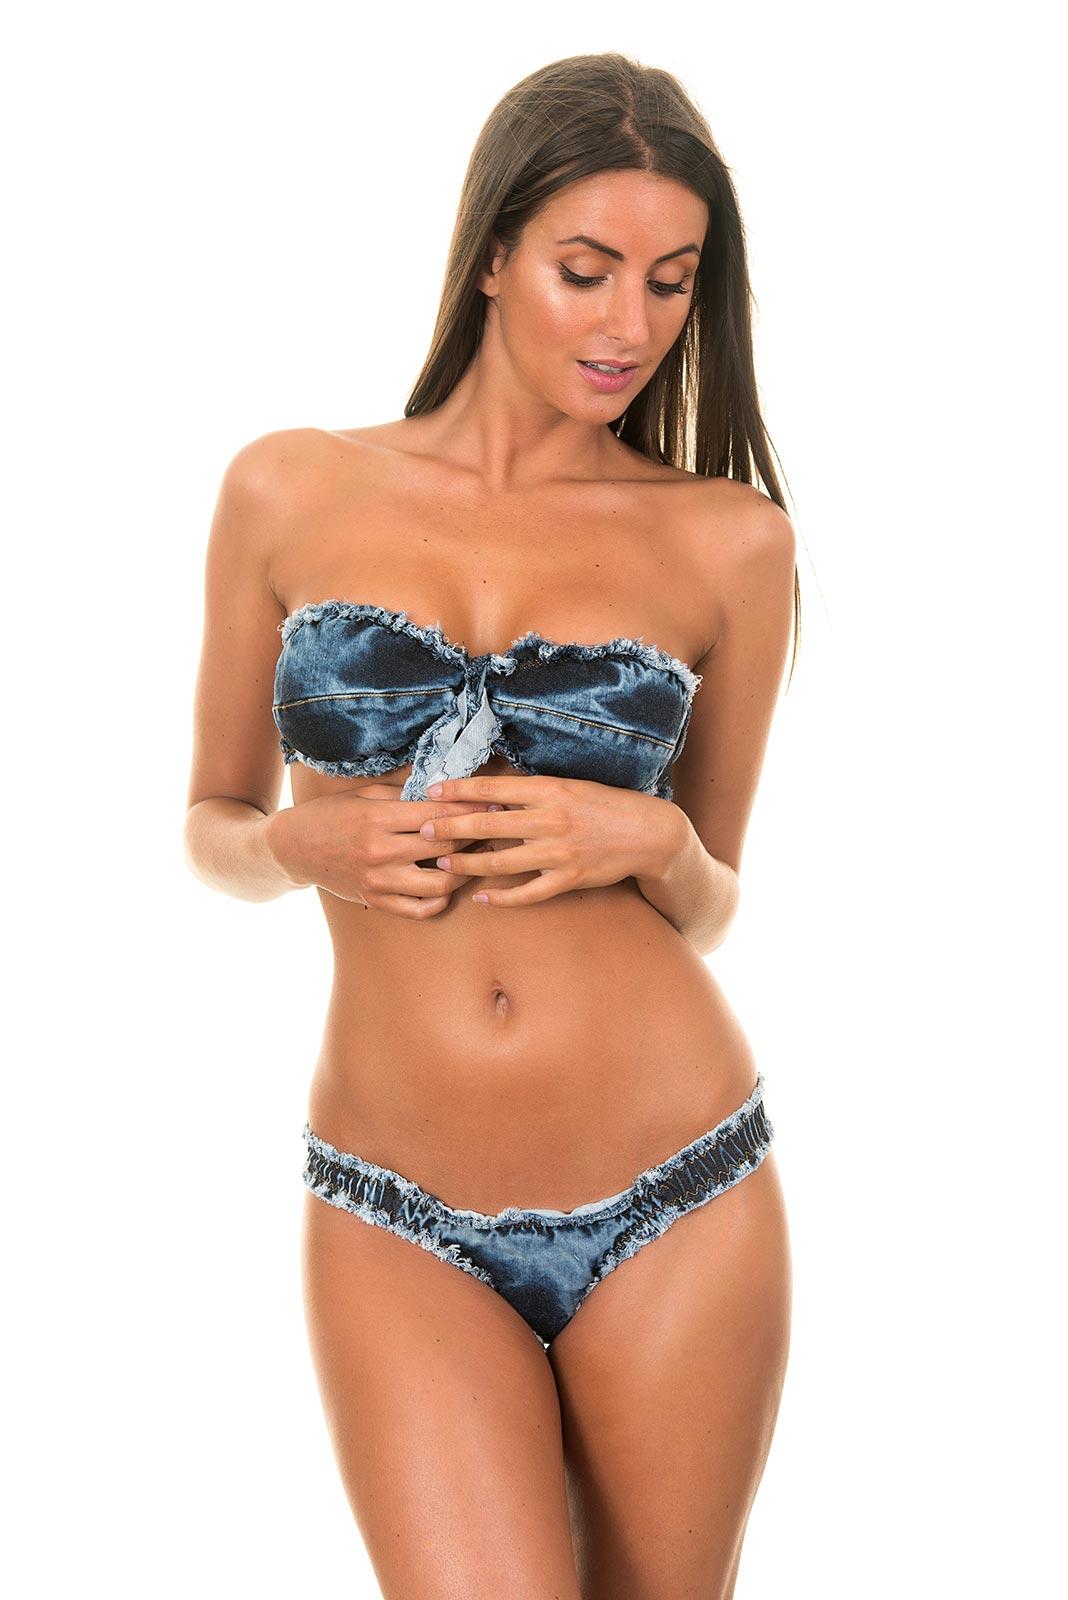 Her strapless bikini bottoms after